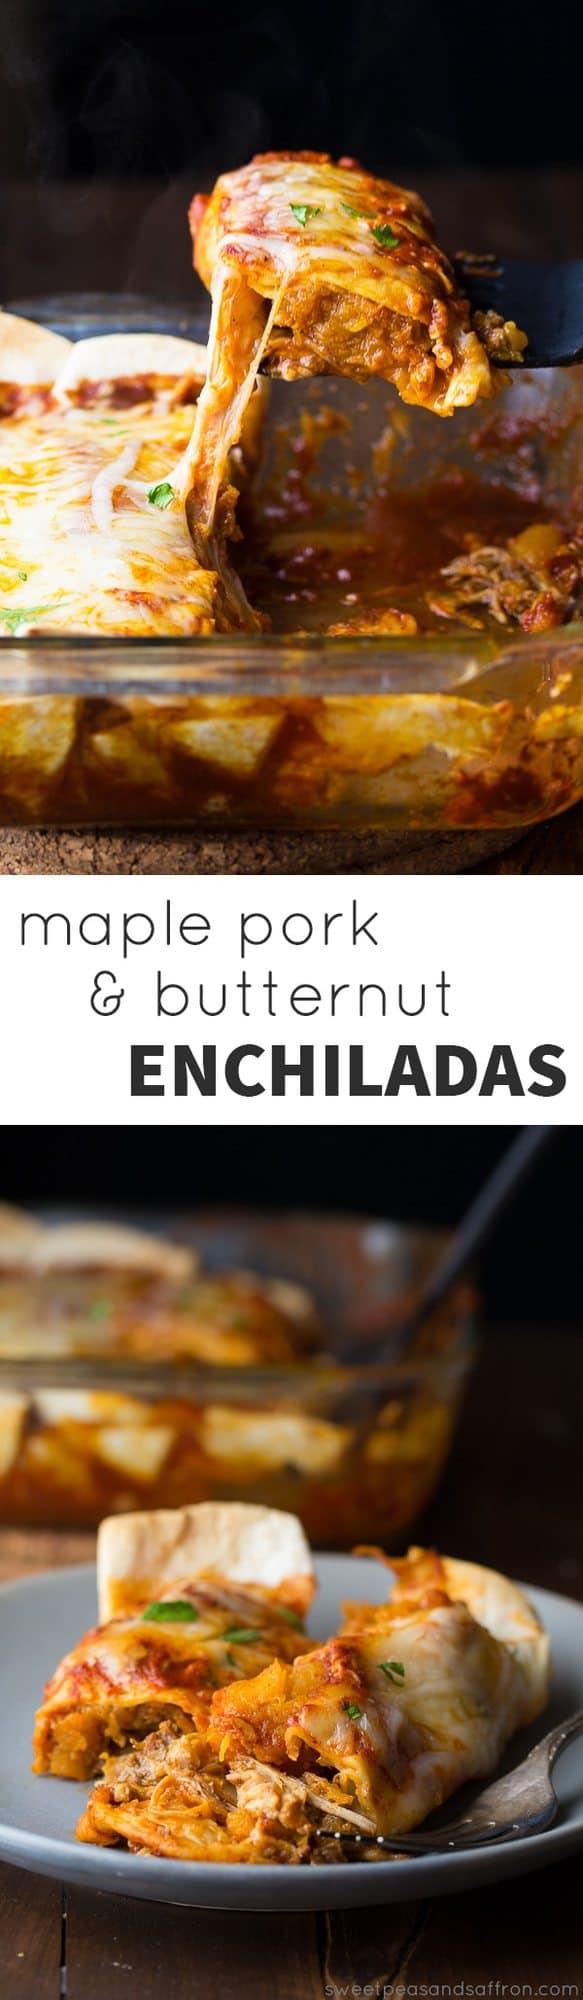 Maple Pulled Pork Enchiladas with Butternut Squash (slow cooker) @sweetpeasaffron